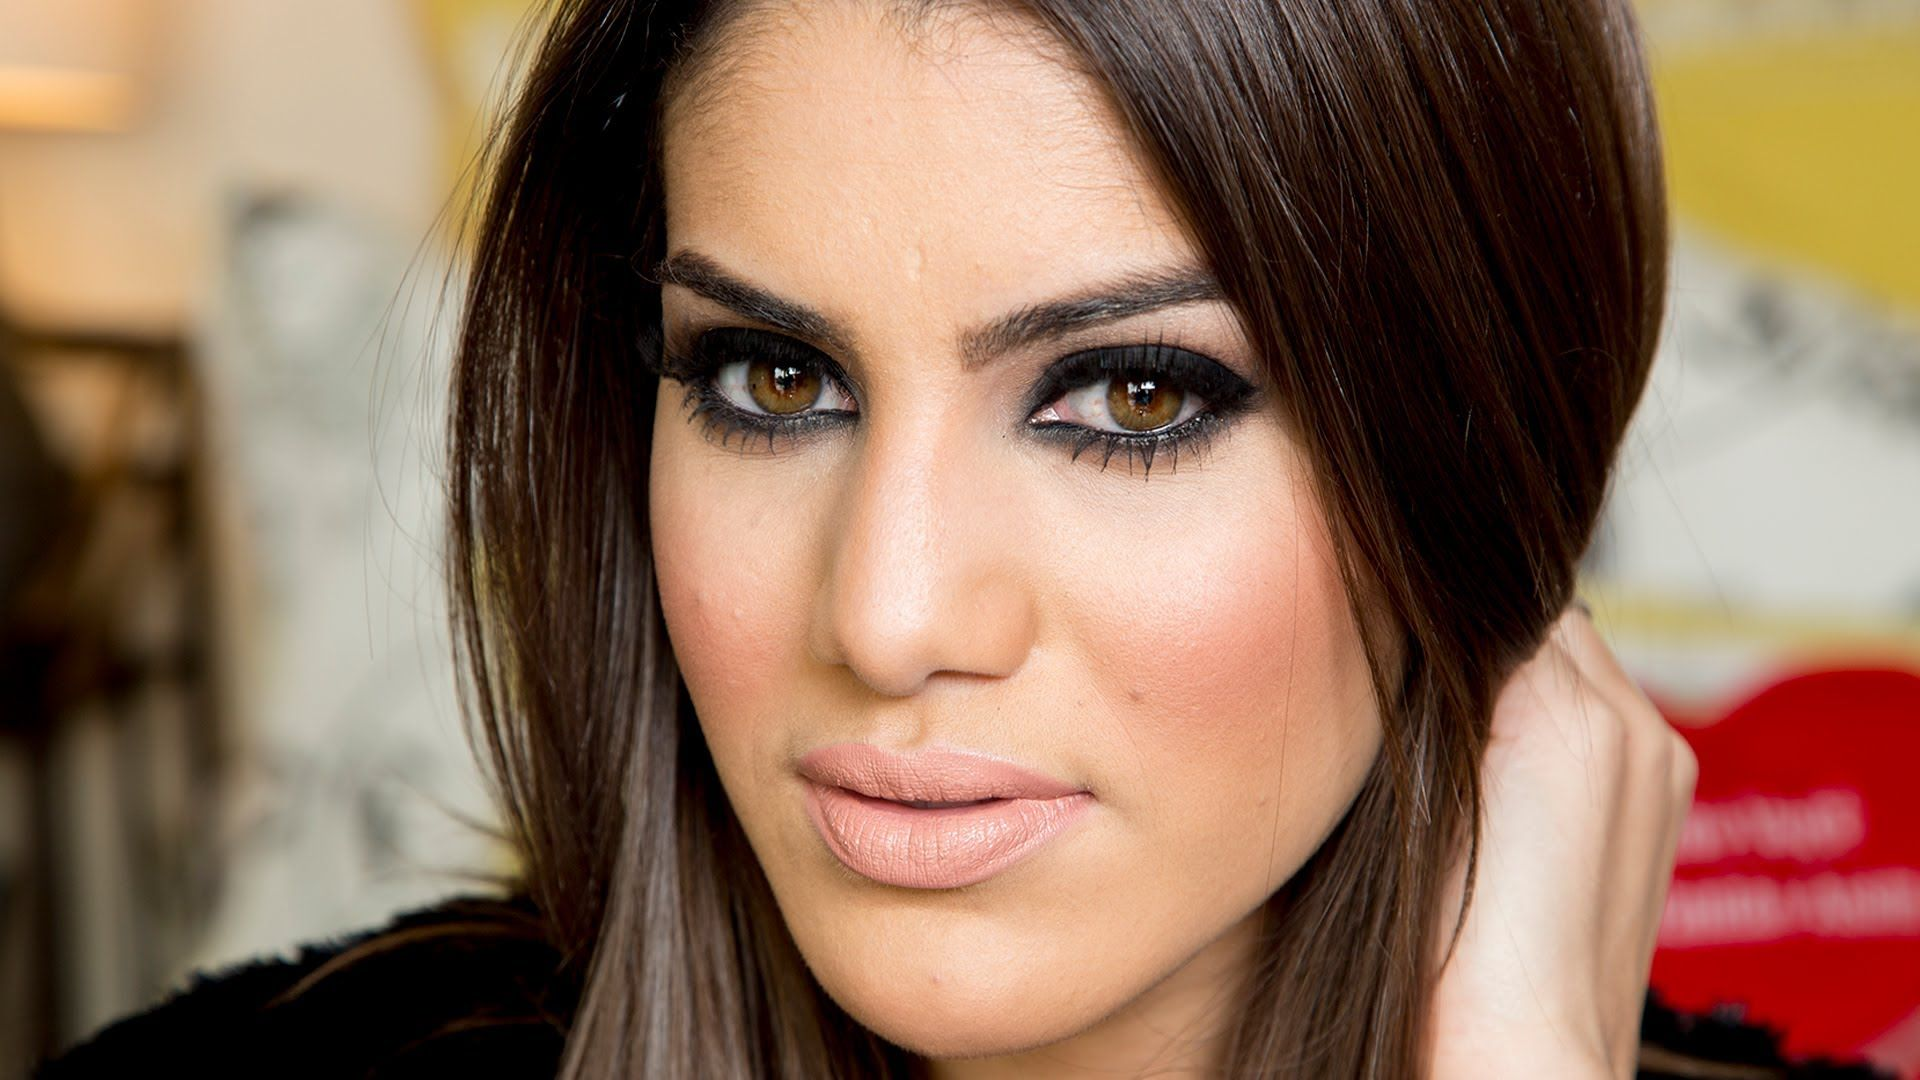 Kim Kardashian Inspired Makeup by Camila Coelho